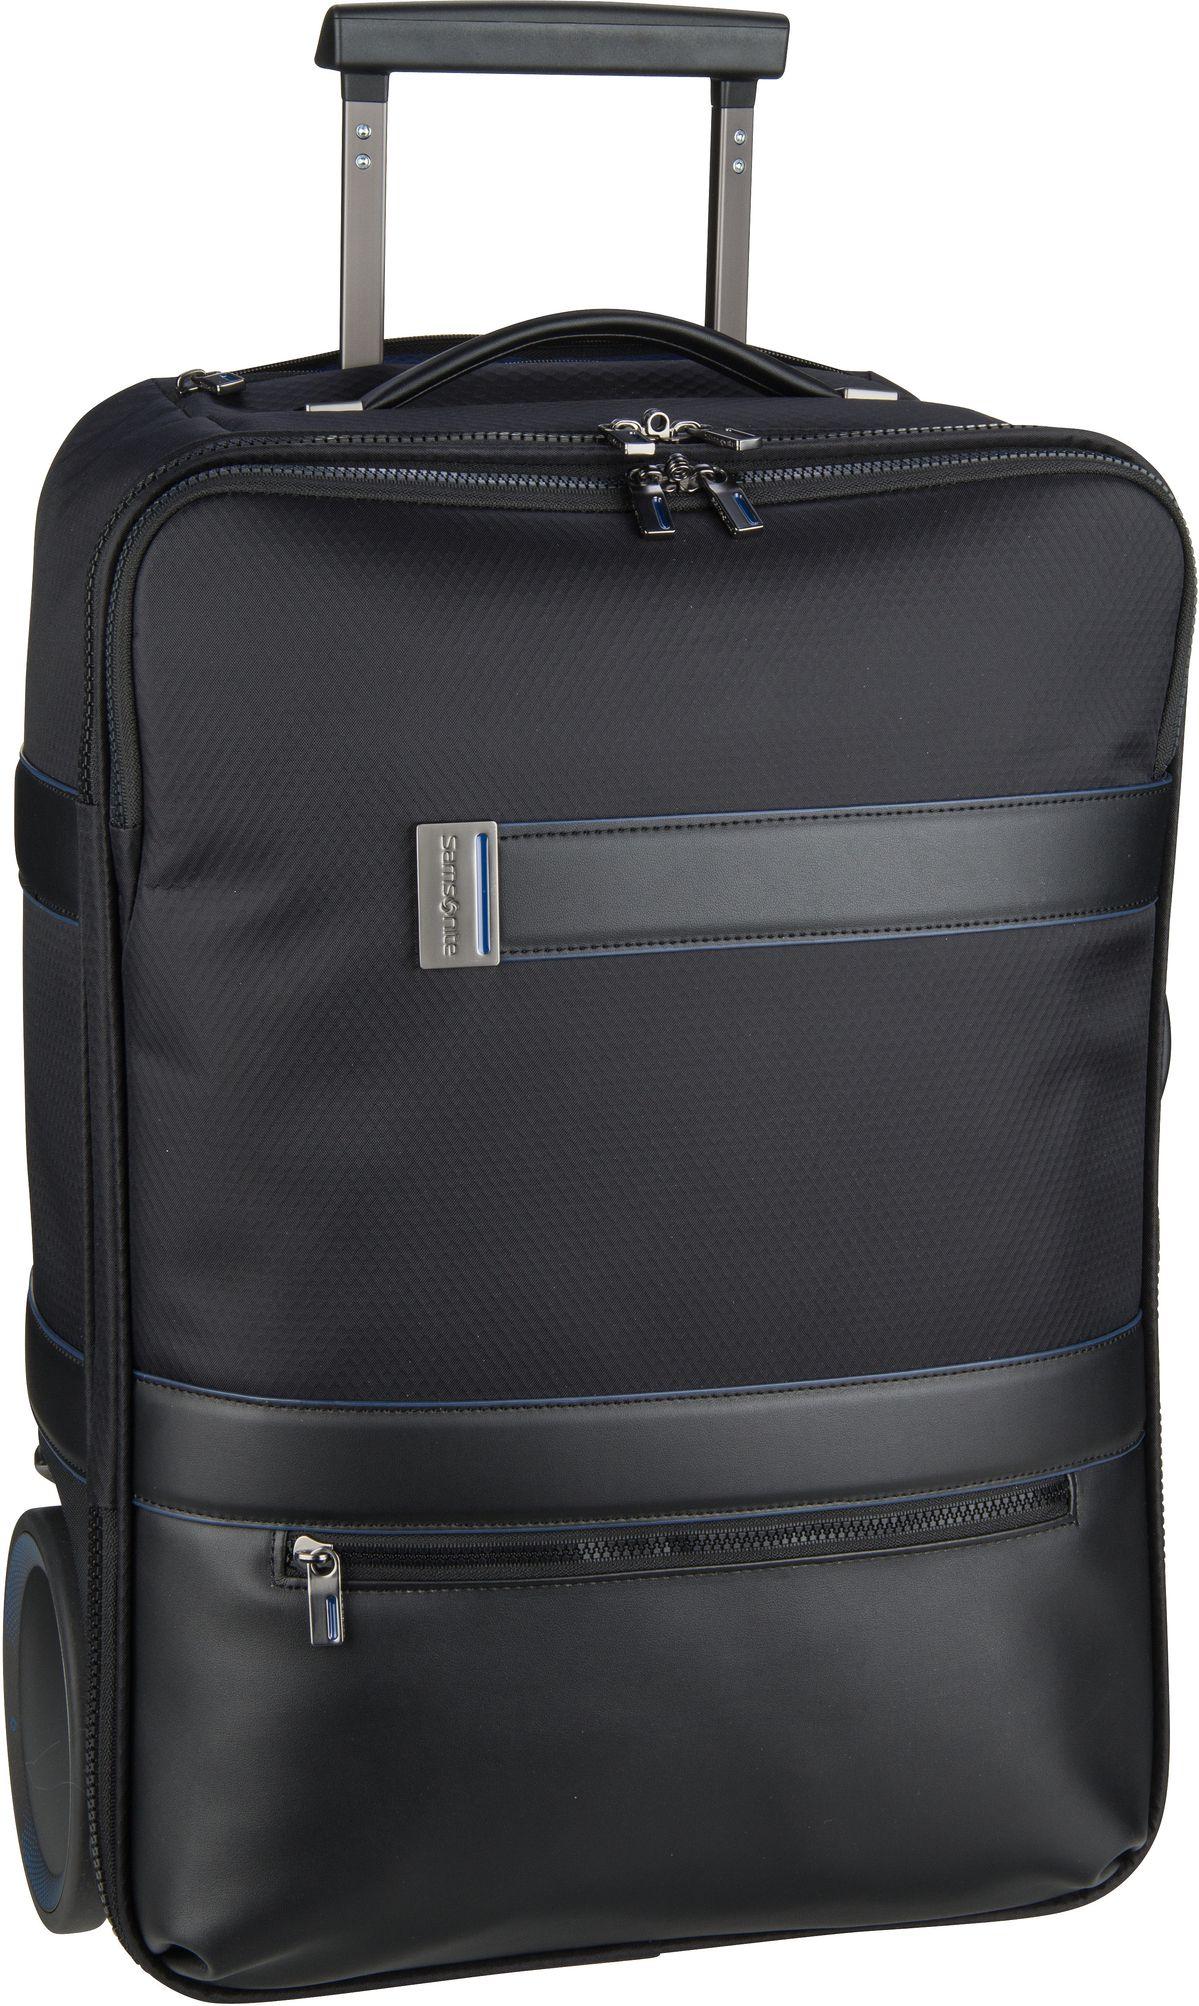 Rucksack-Trolley Zigo Duffle/Wh 55 Backpack Black (35 Liter)